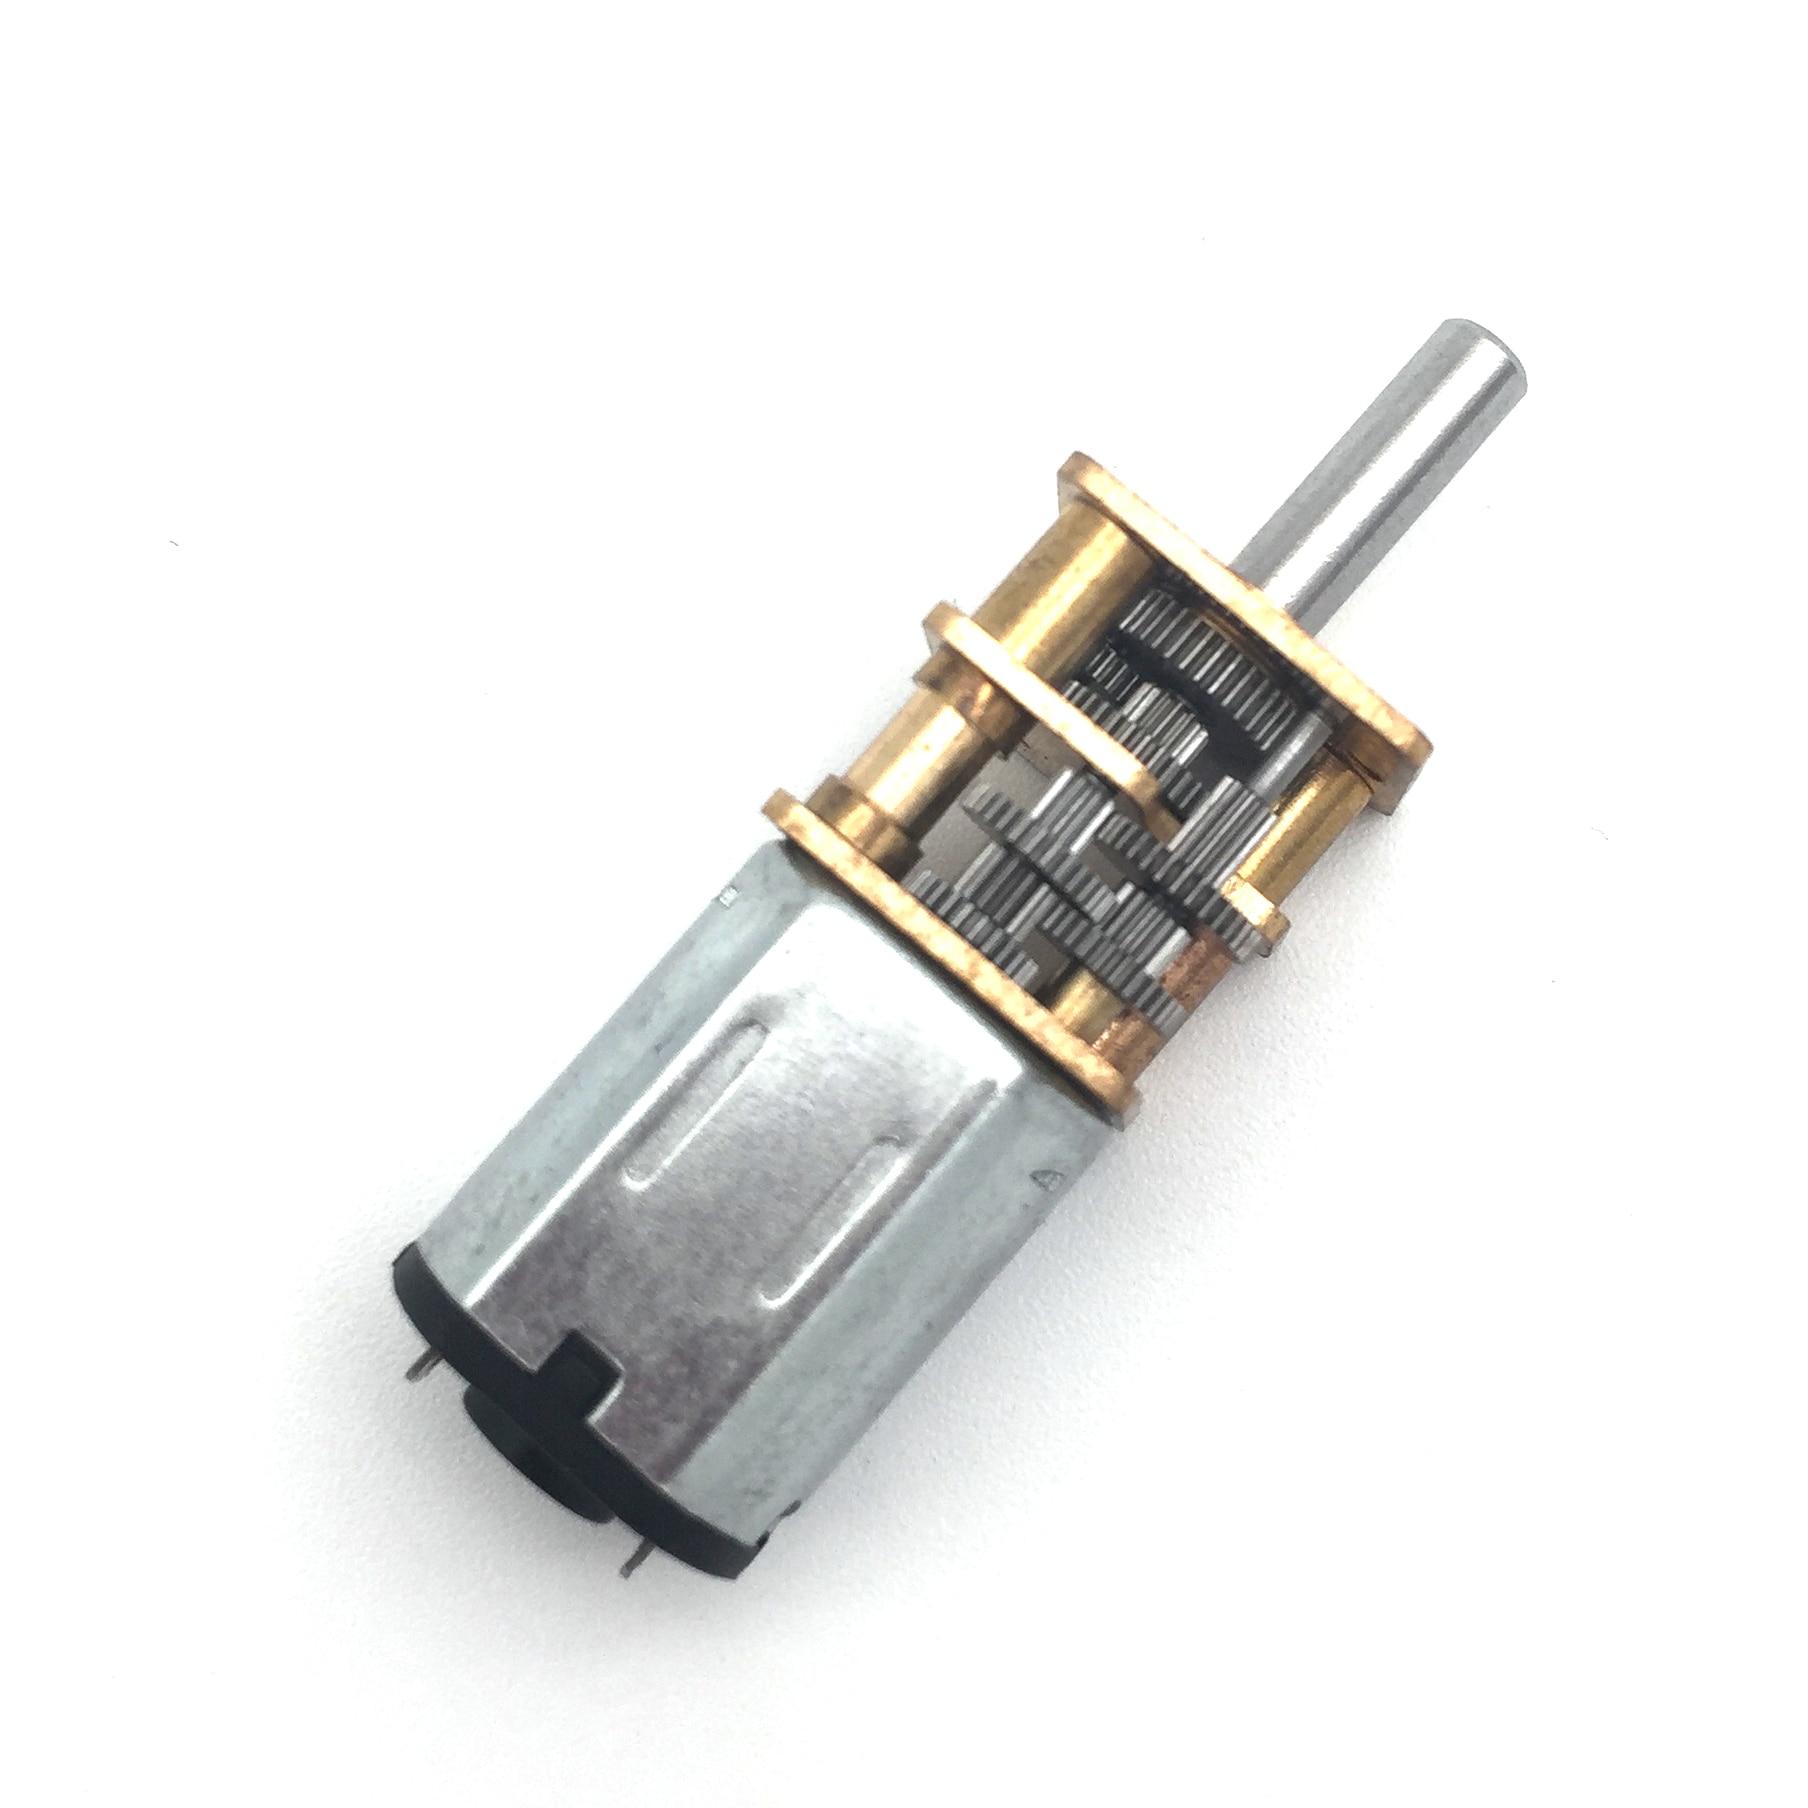 N20 500RPM DC6V Micro DC Geared Motor Powerful Electric Mini Deceleration Gear Reducer Motors Mayitr